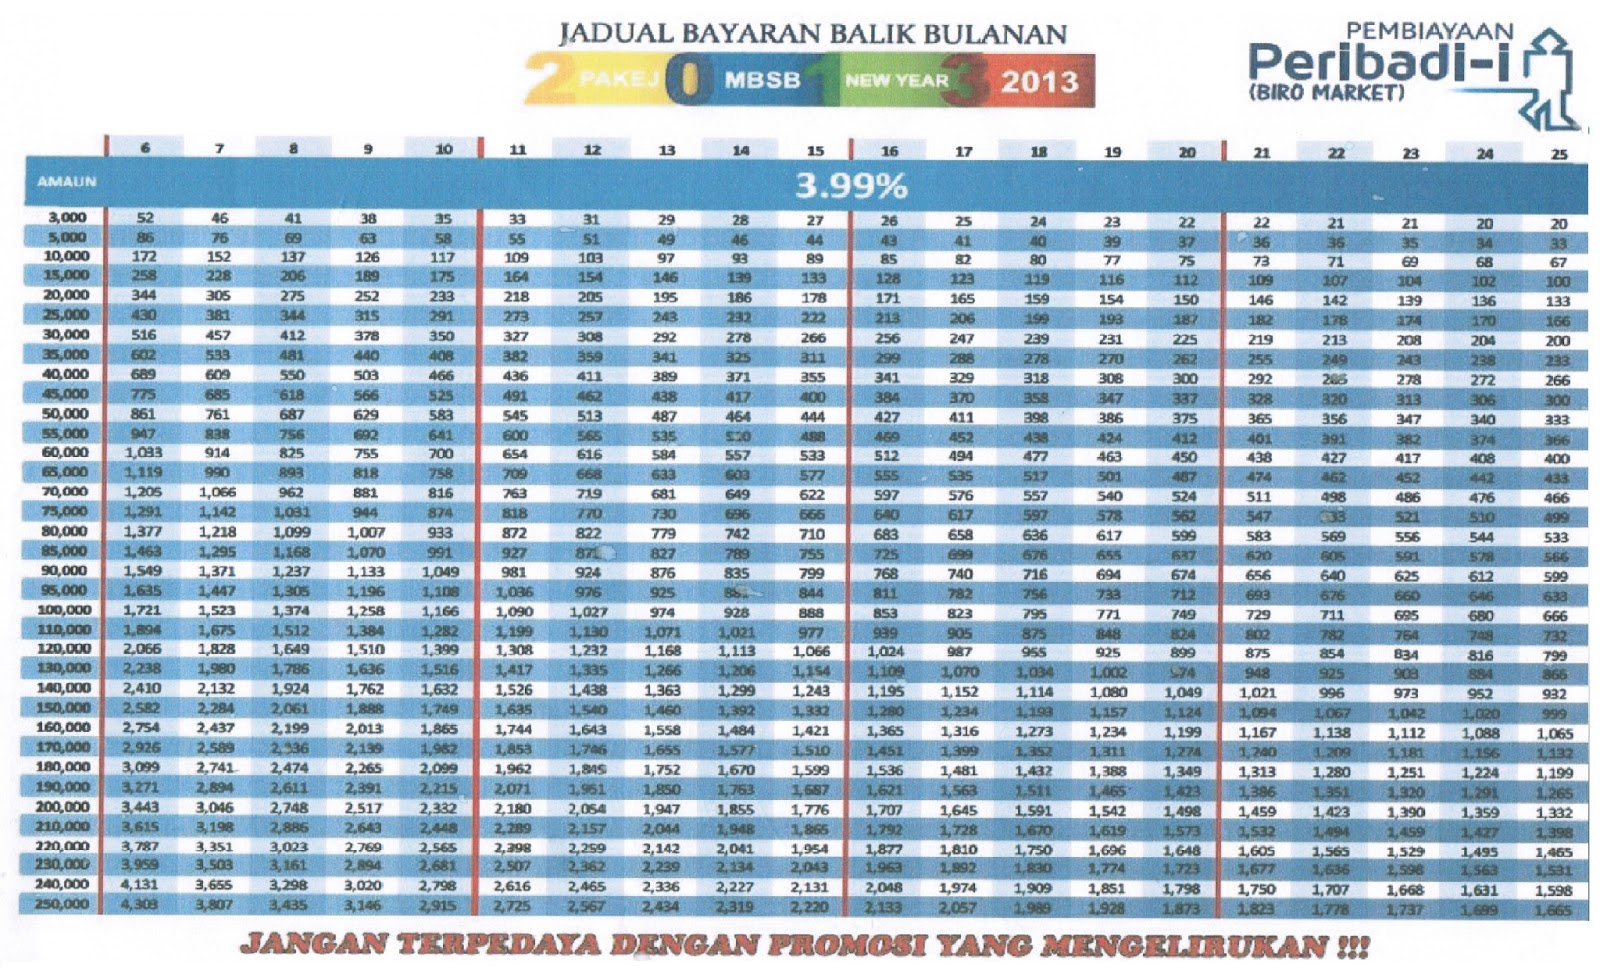 Bank Rhb Personal Loan